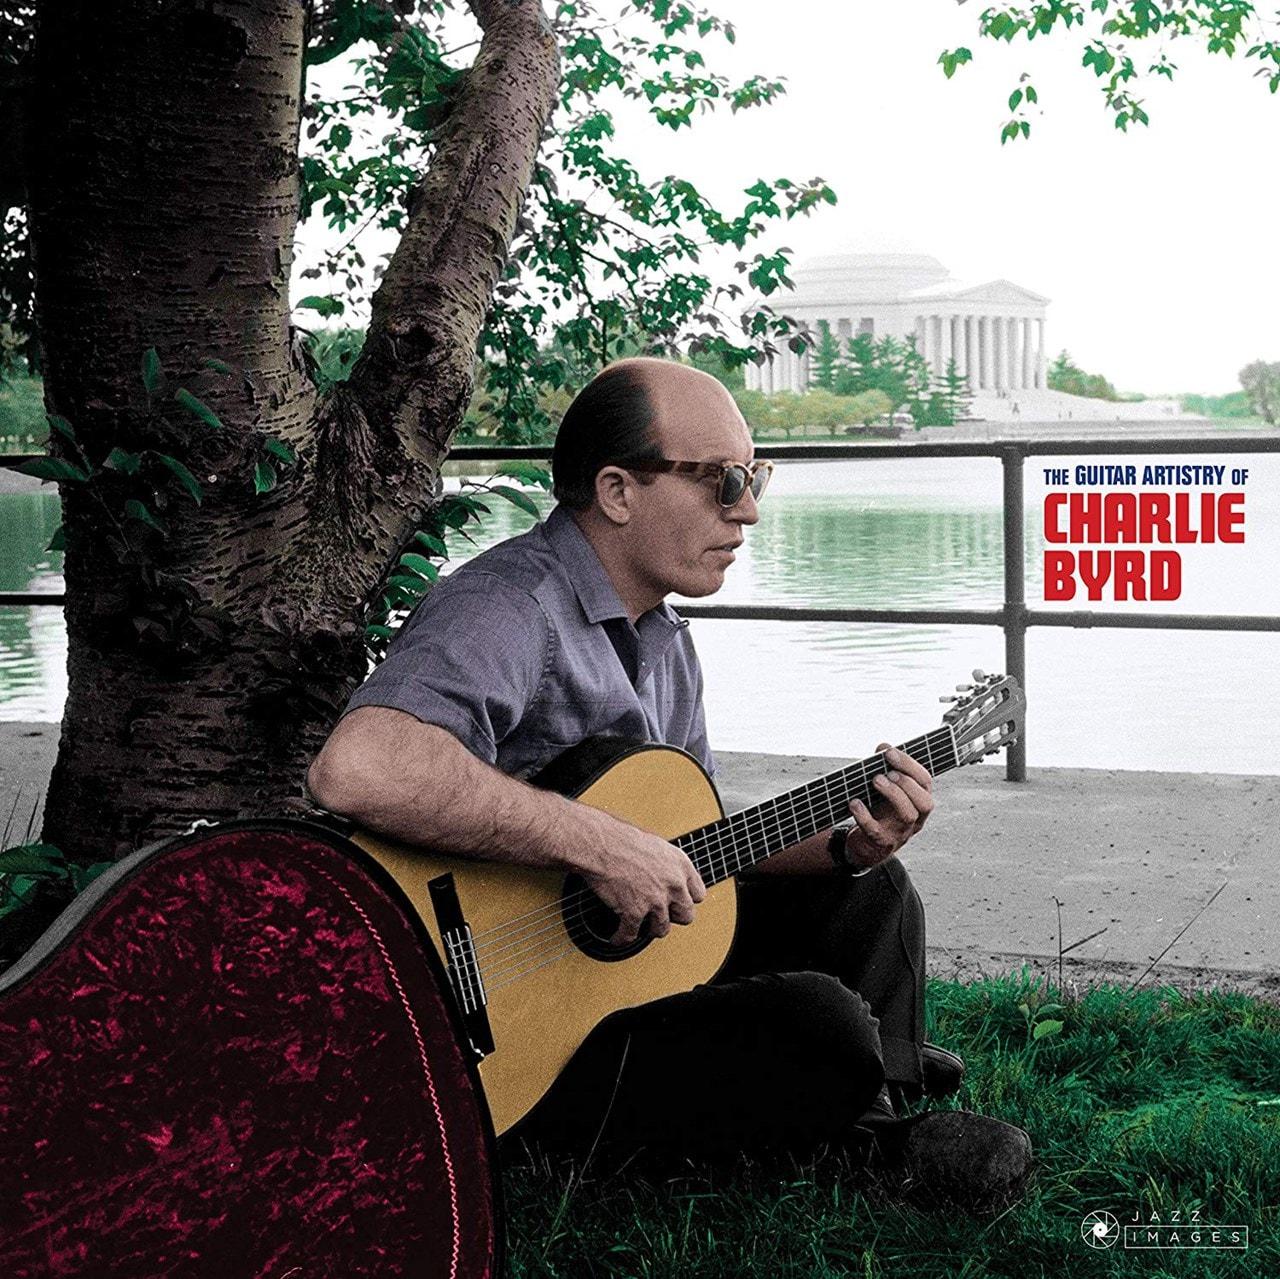 The Guitar Artistry of Charlie Byrd - 1